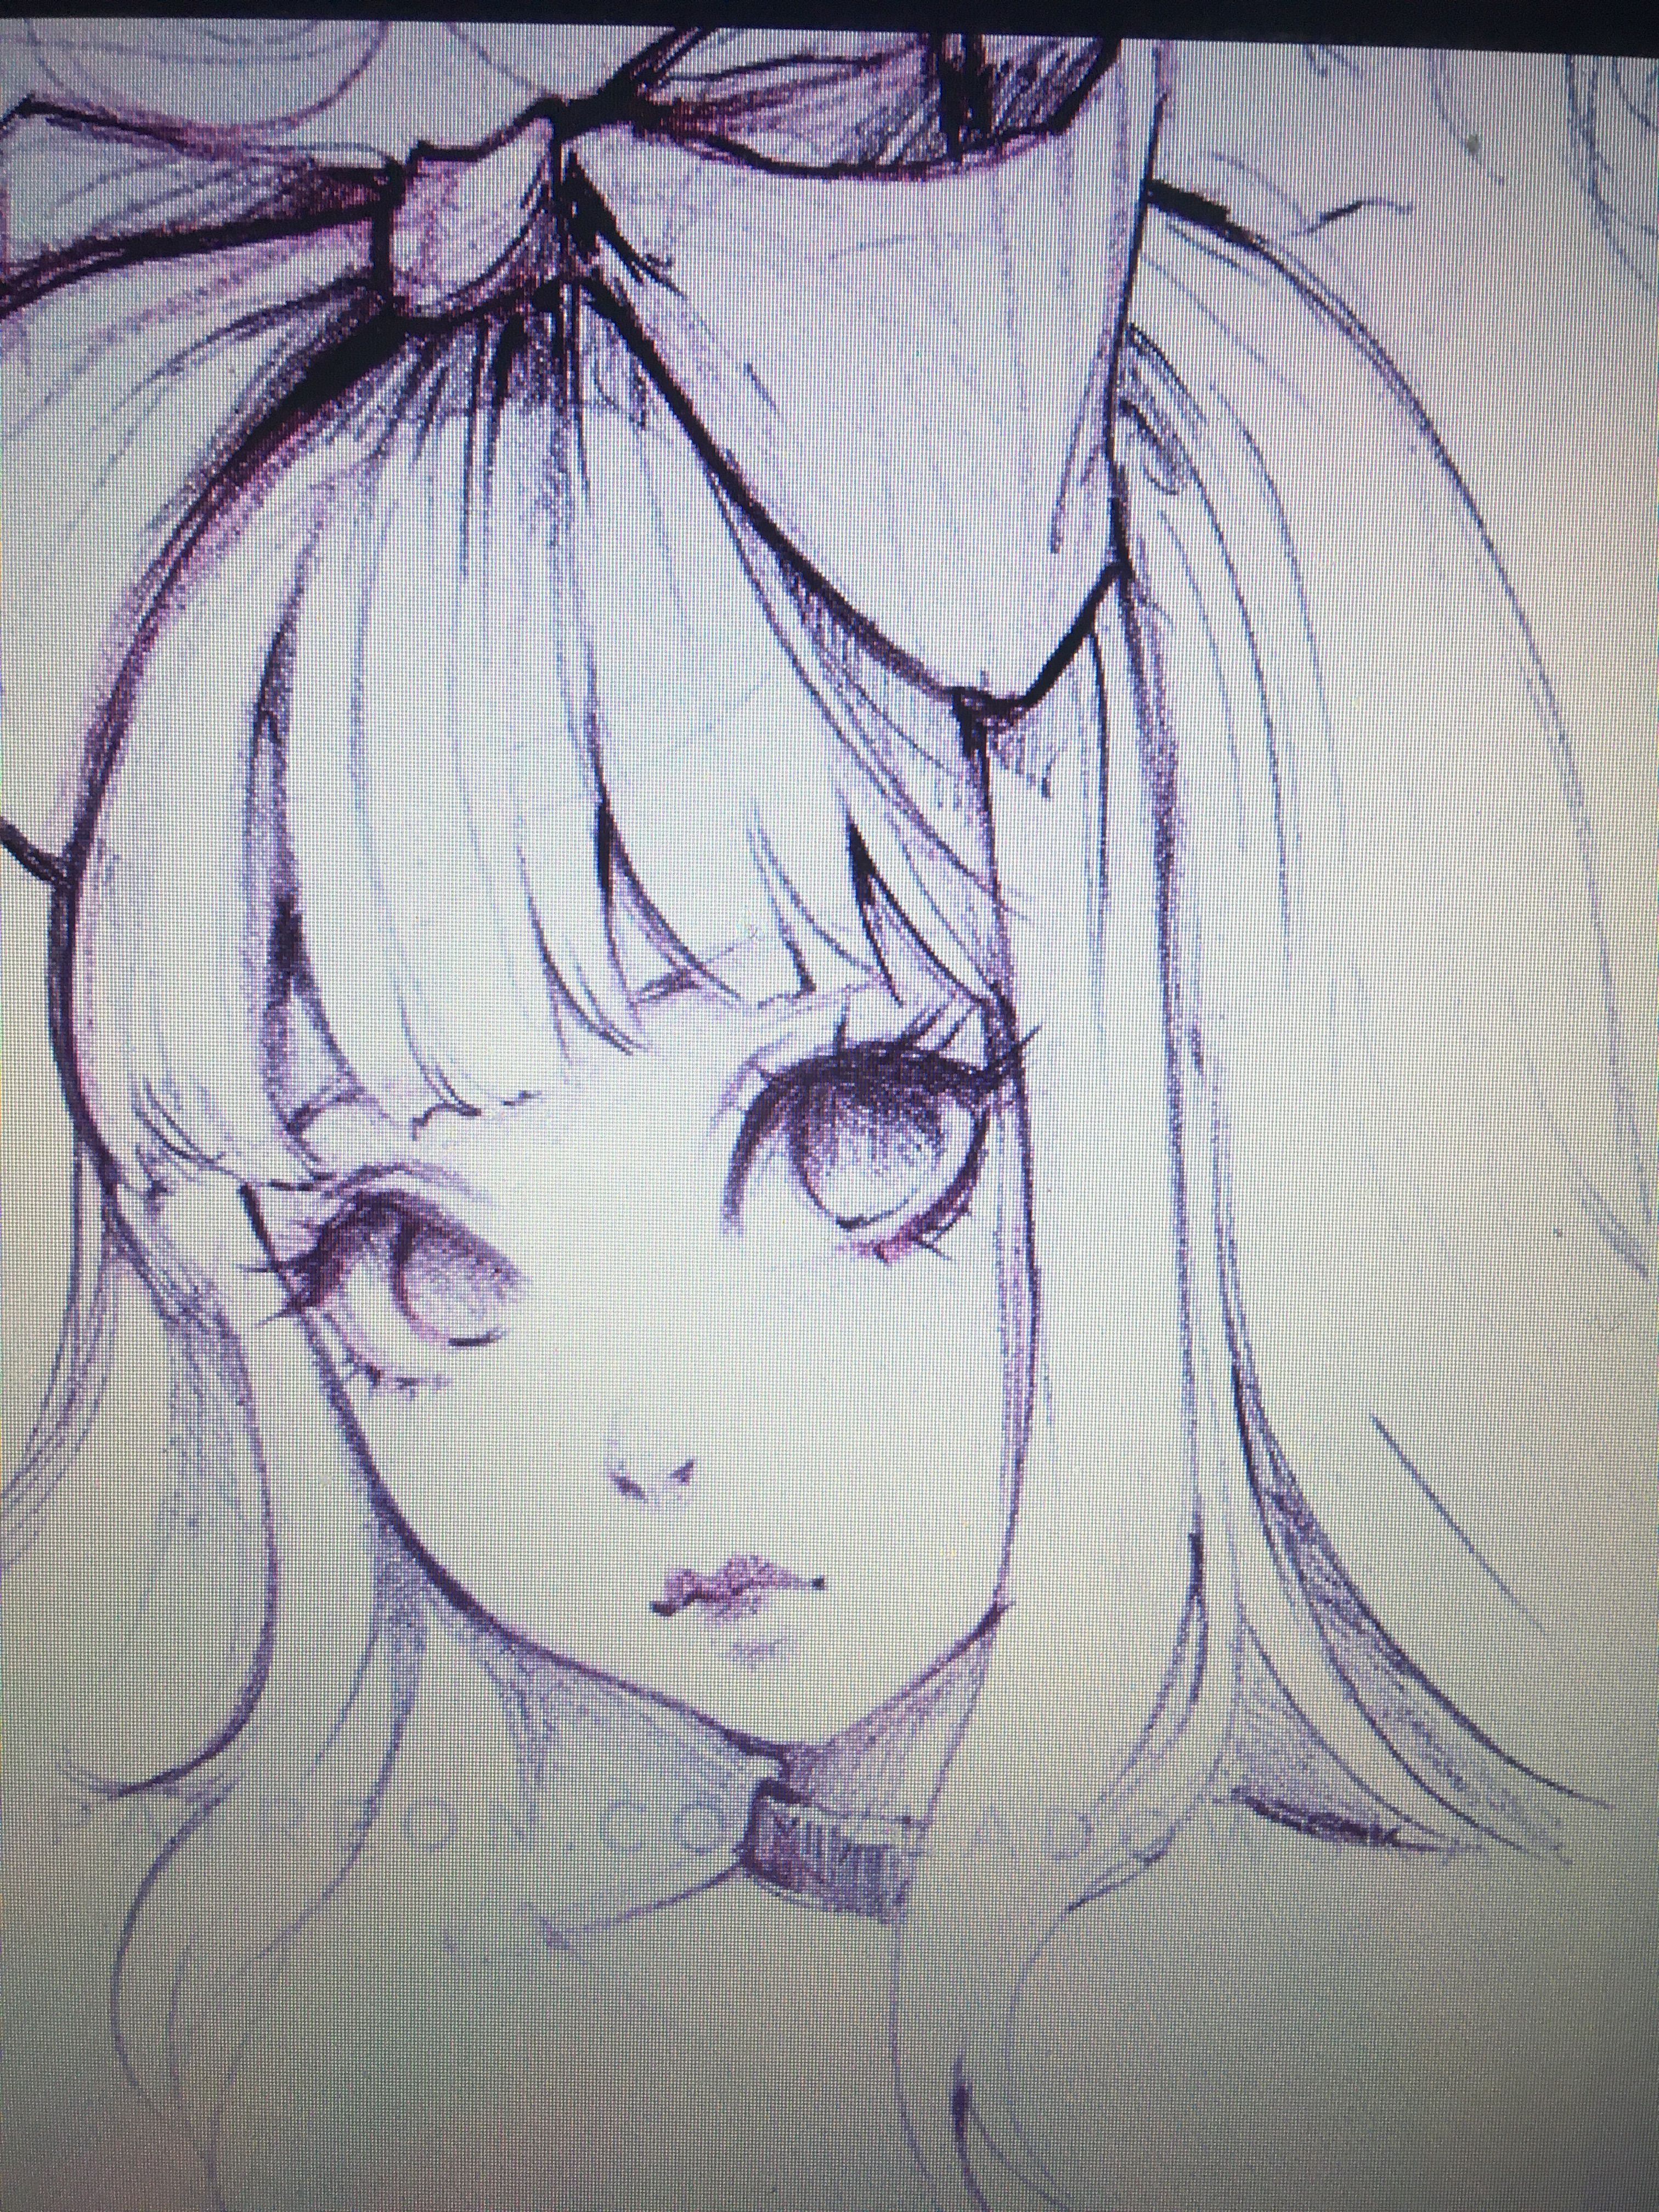 Pin By Malena Abastoflor Cordova On Pollito Anime Art Drawings Drawing Tutorial